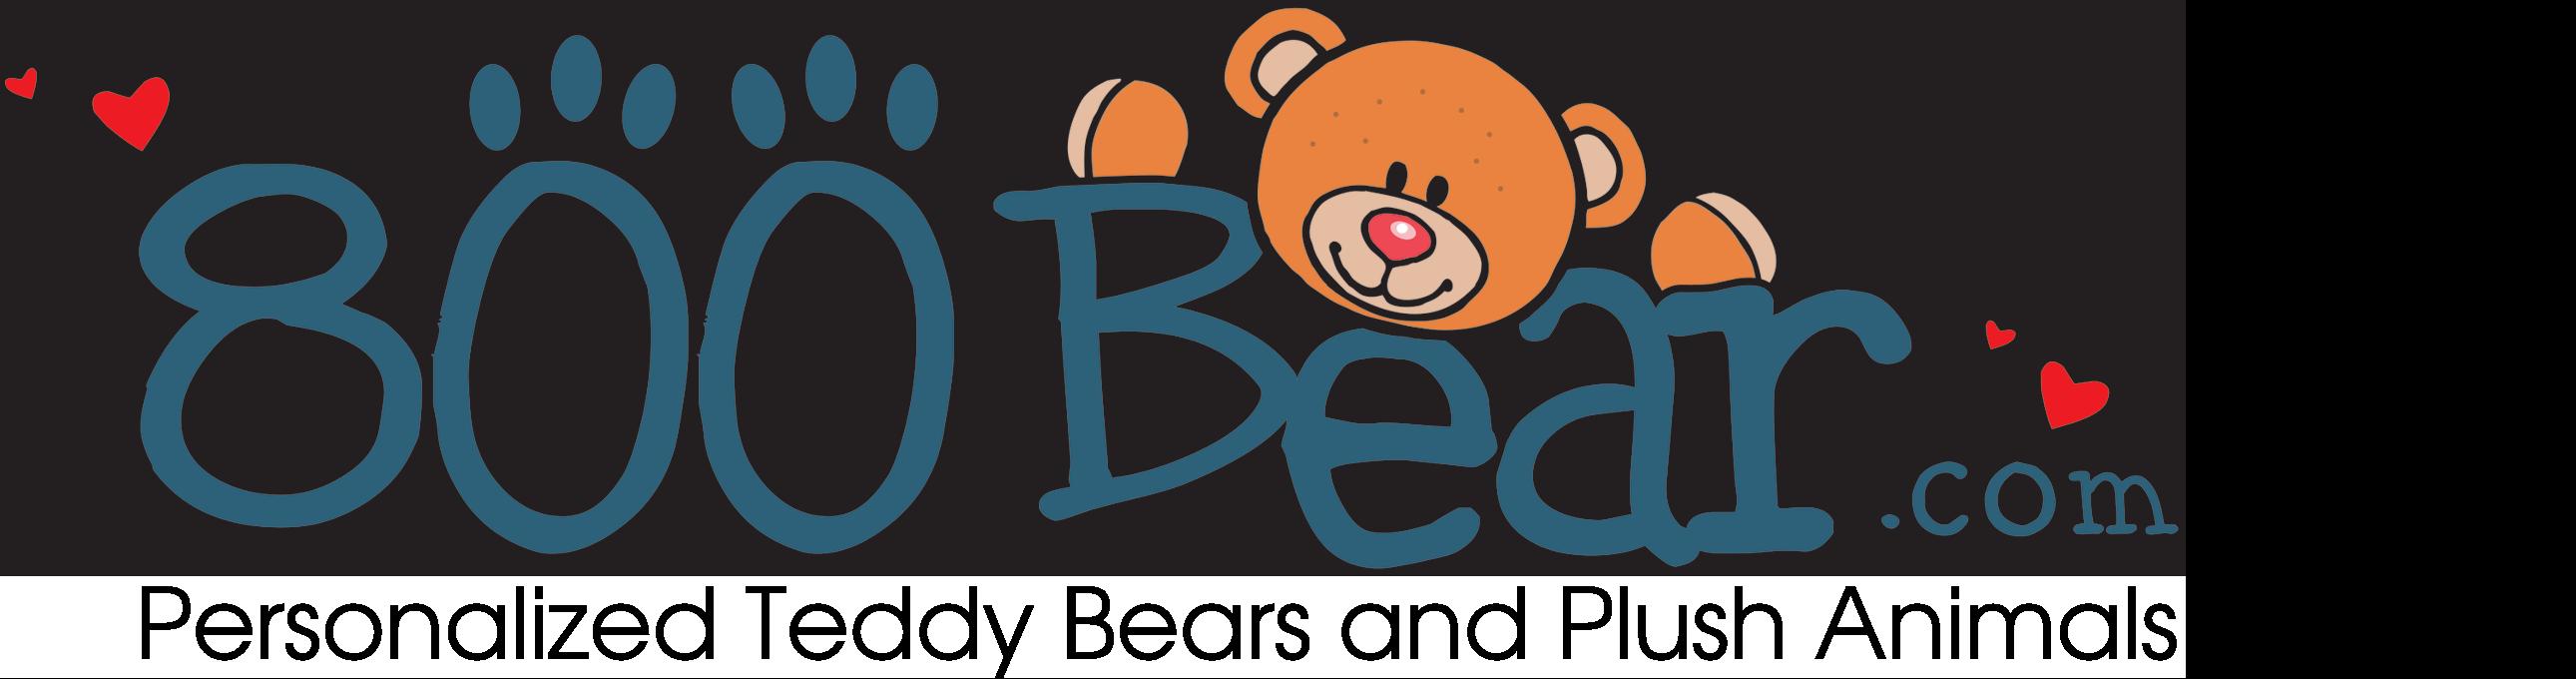 800Bear - Plush Thoughts